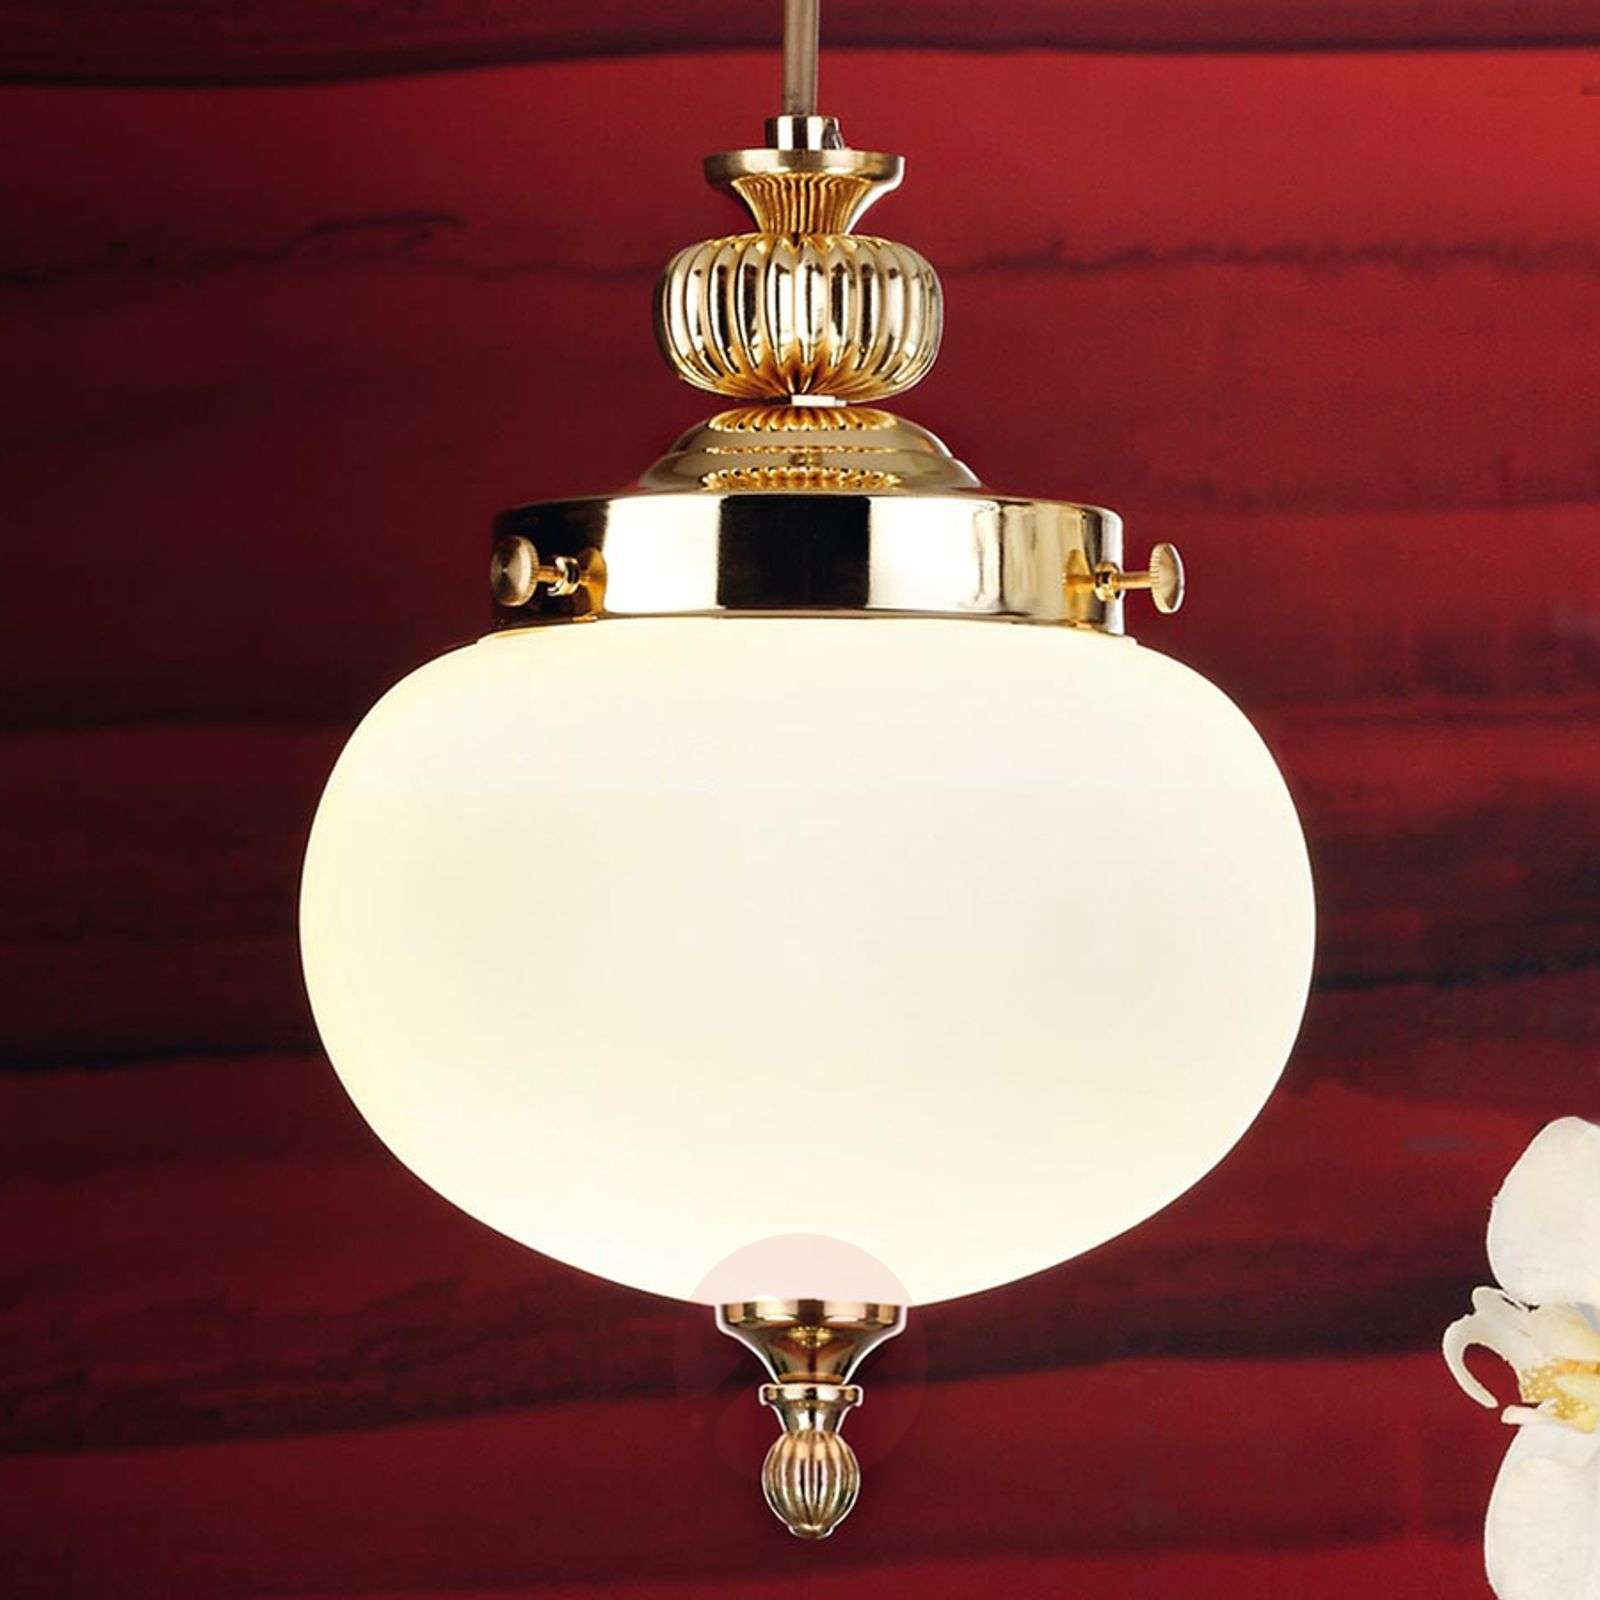 1-bulb Ophelia glass pendant light-7255223-01